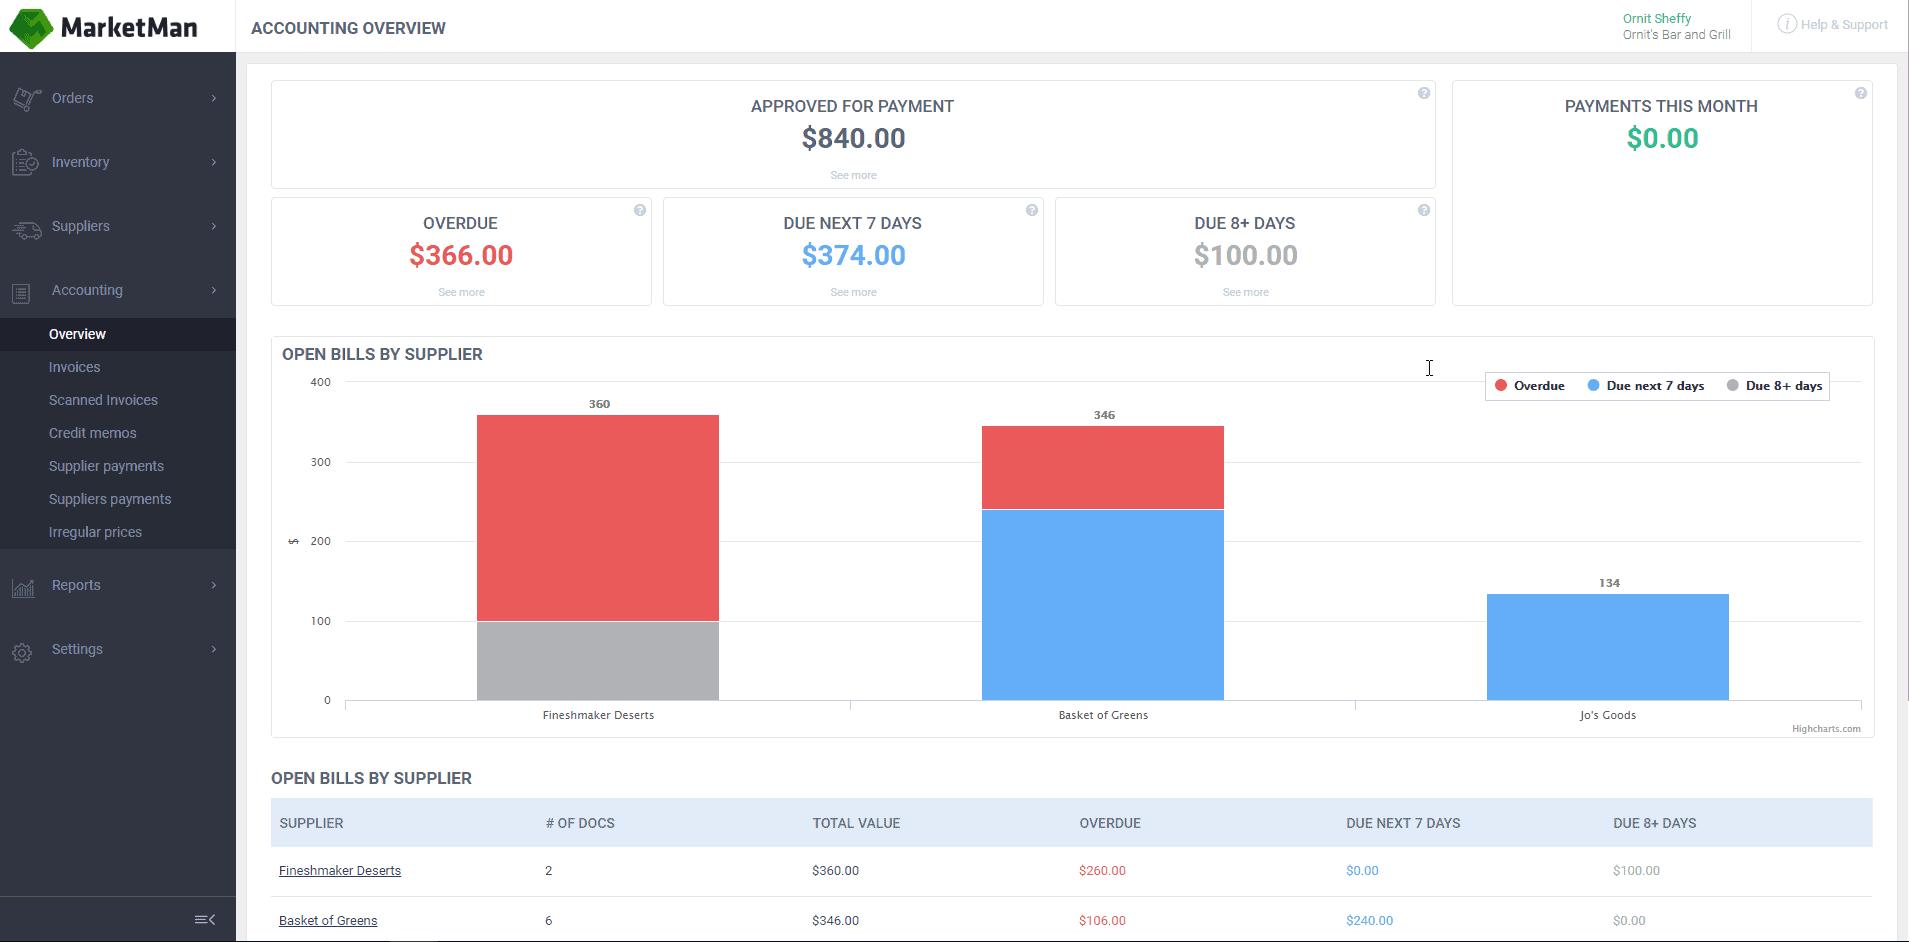 Vendor Payments - Overview Screenshot